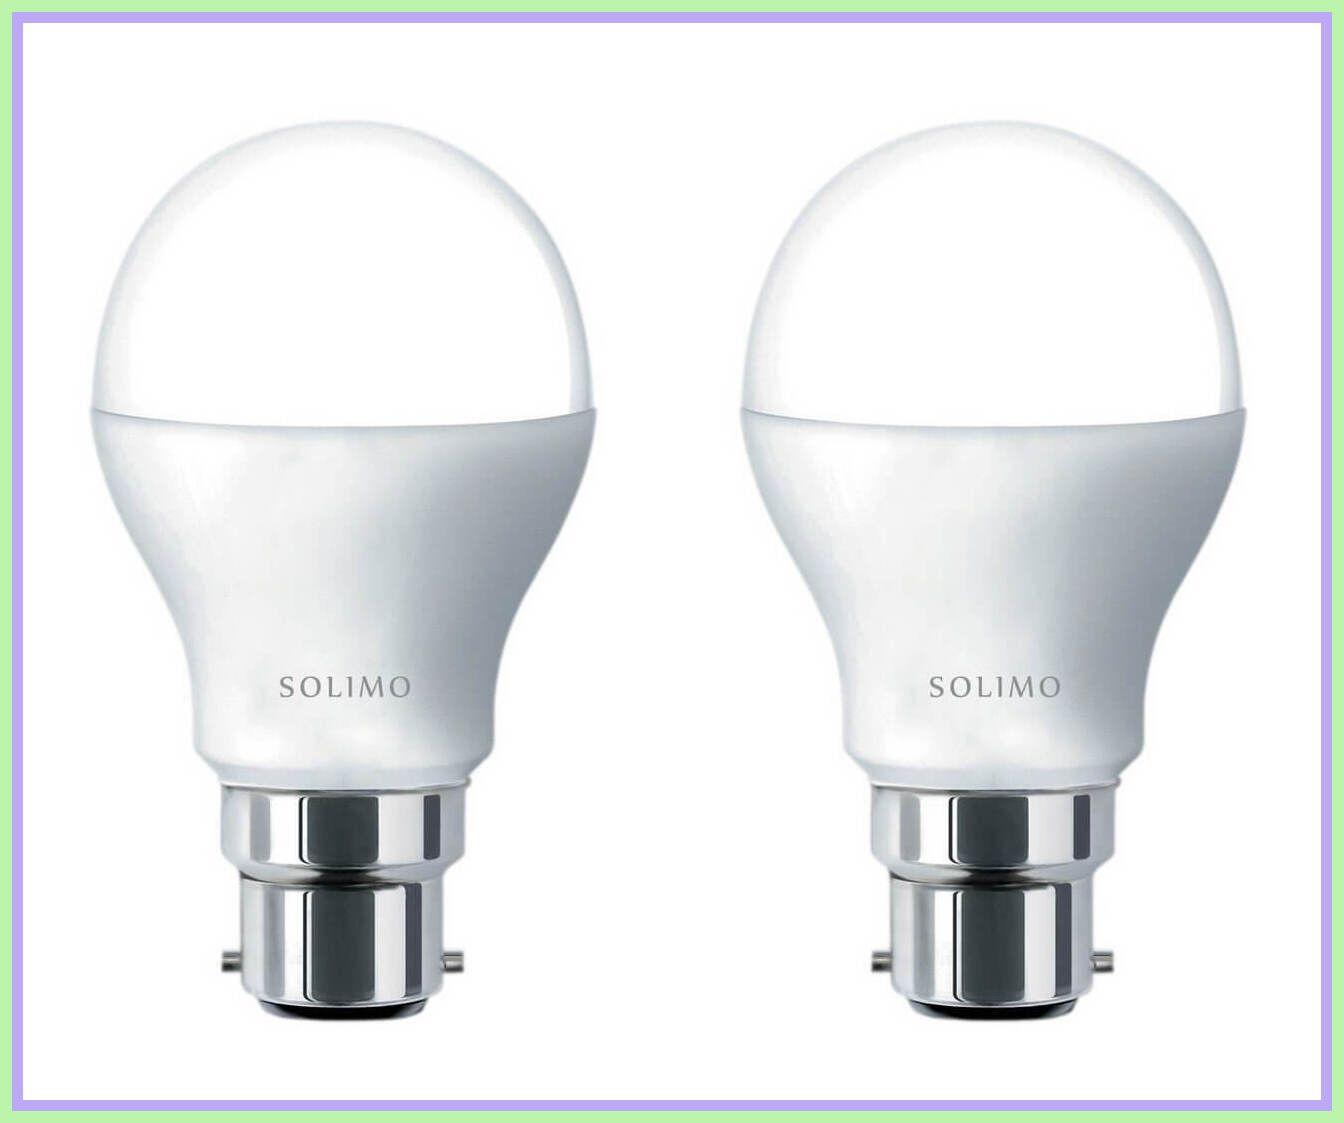 114 Reference Of Led Light Bulbs Amazon In 2020 Led Bulb Led Lights Led Light Bulbs